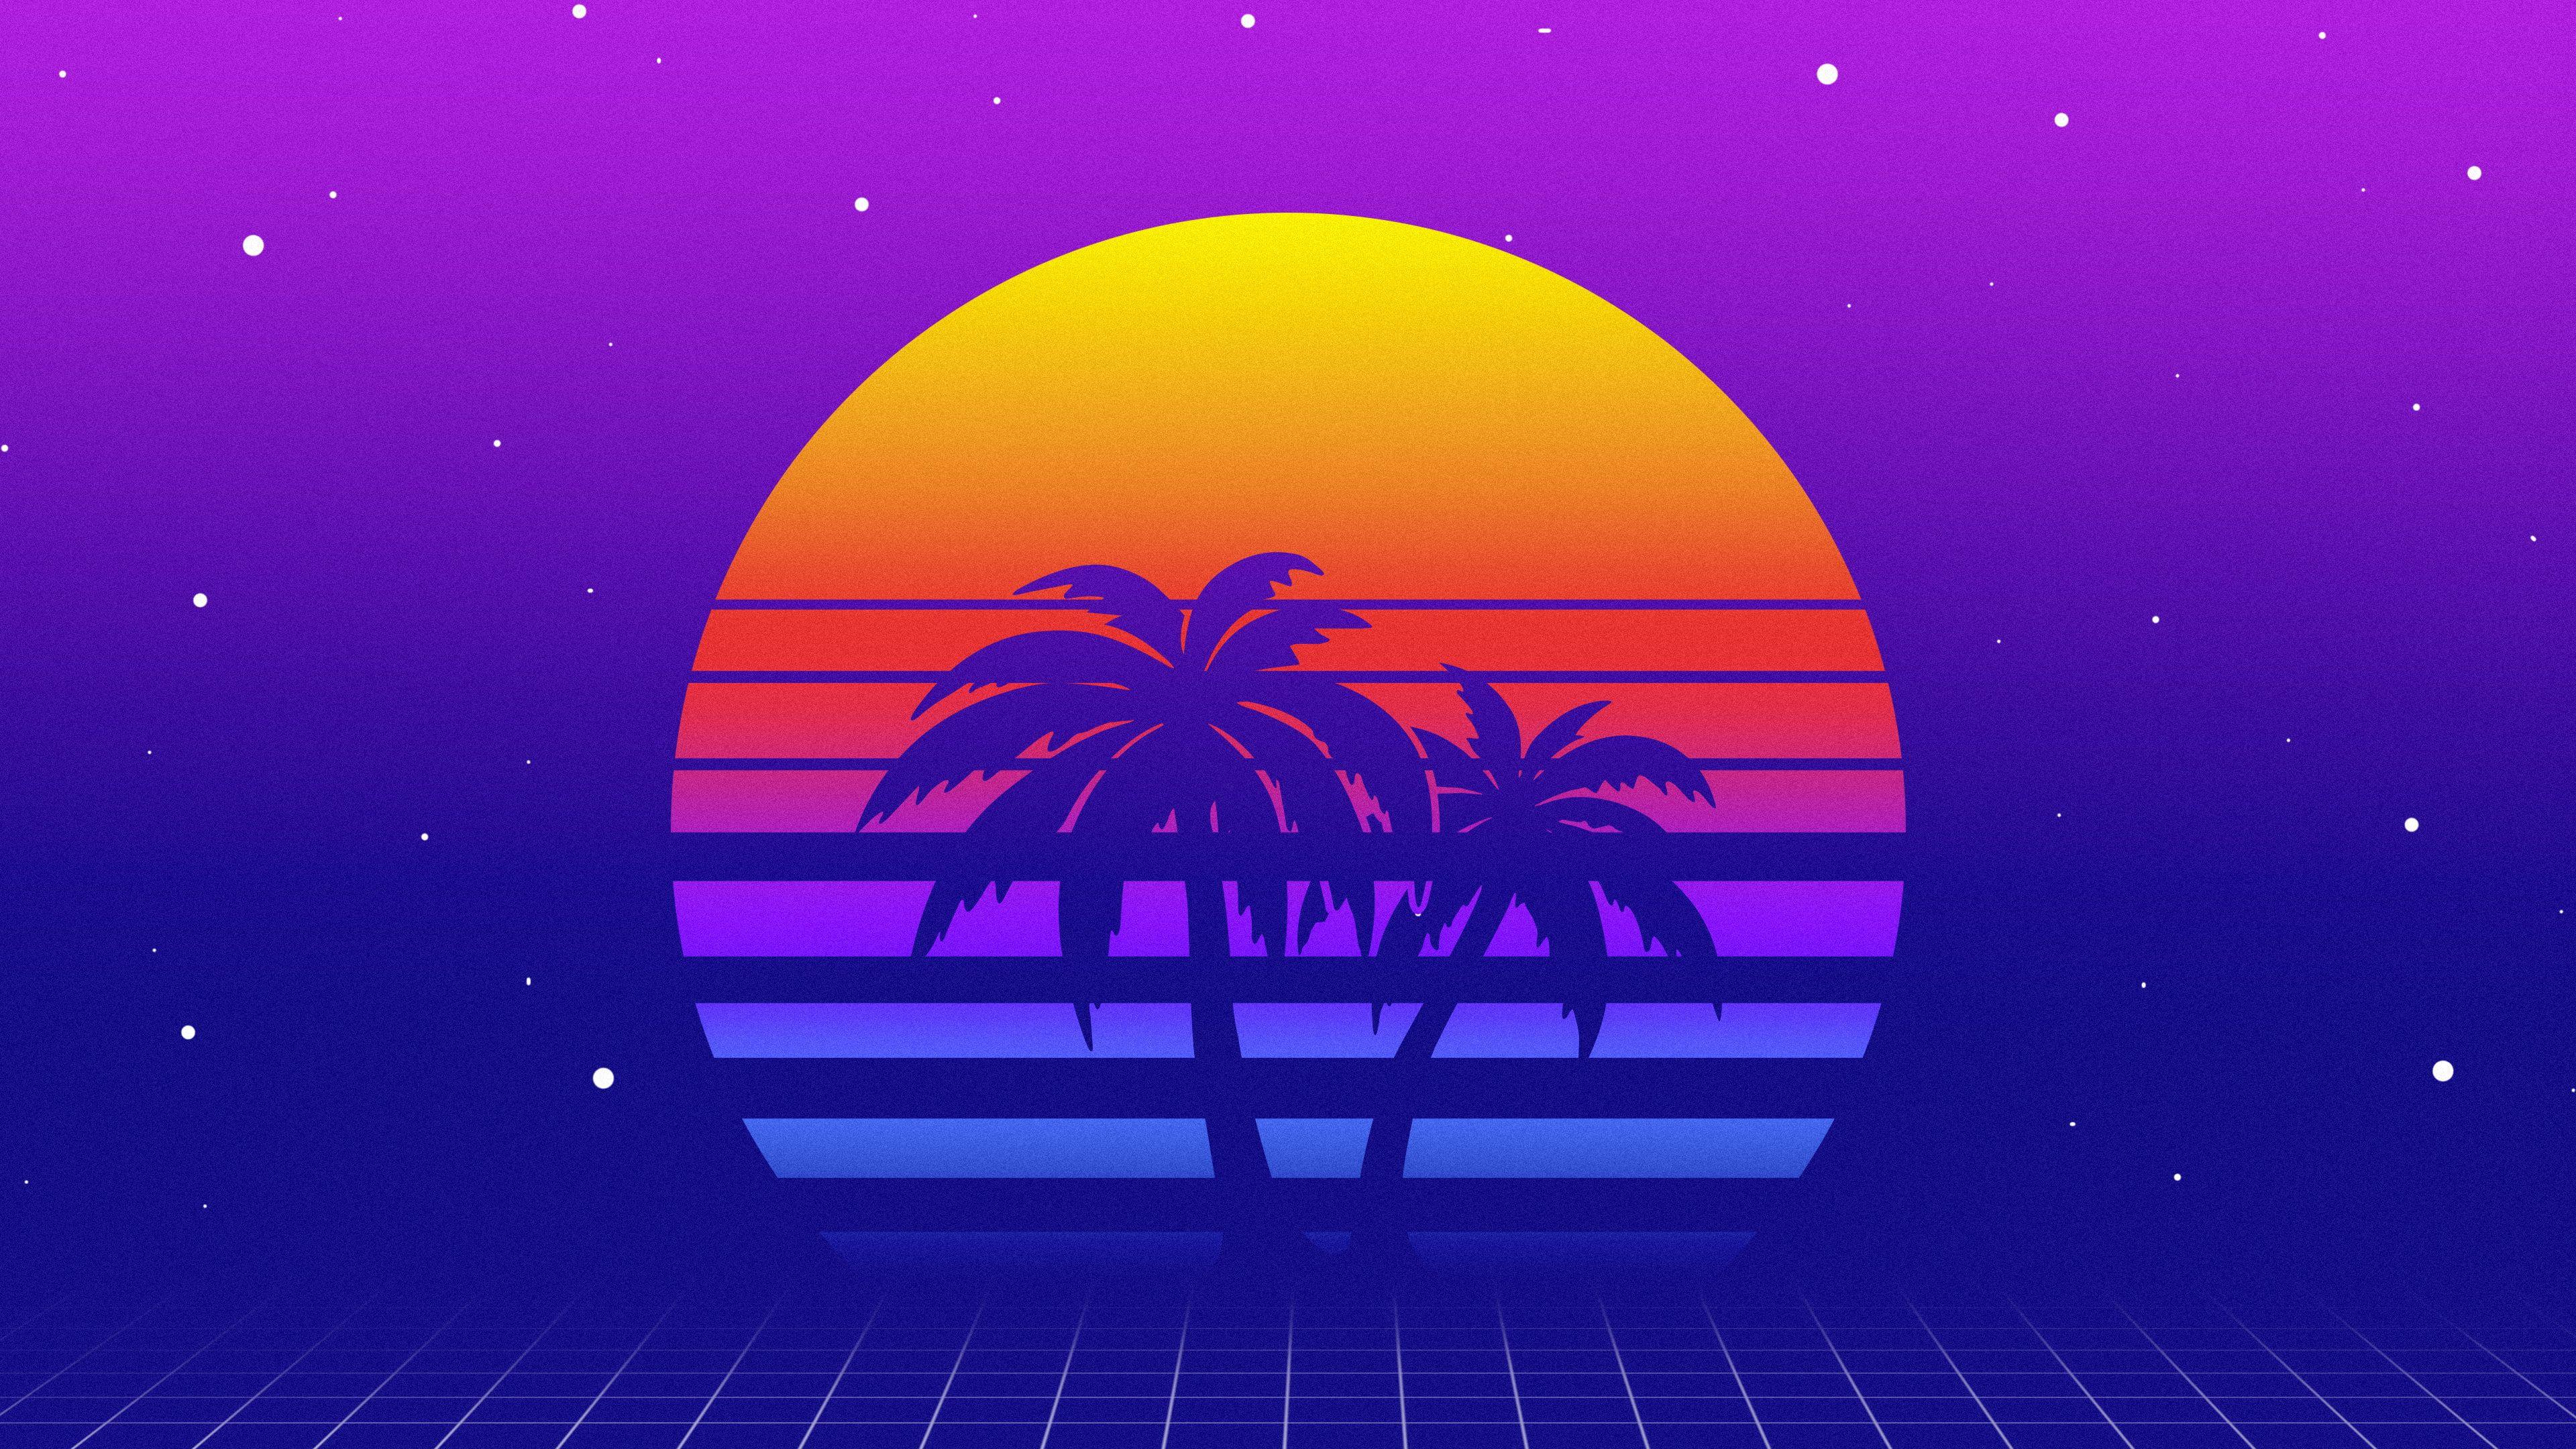 sunset retrowave digital art synthwave 4K wallpaper 3840x2160